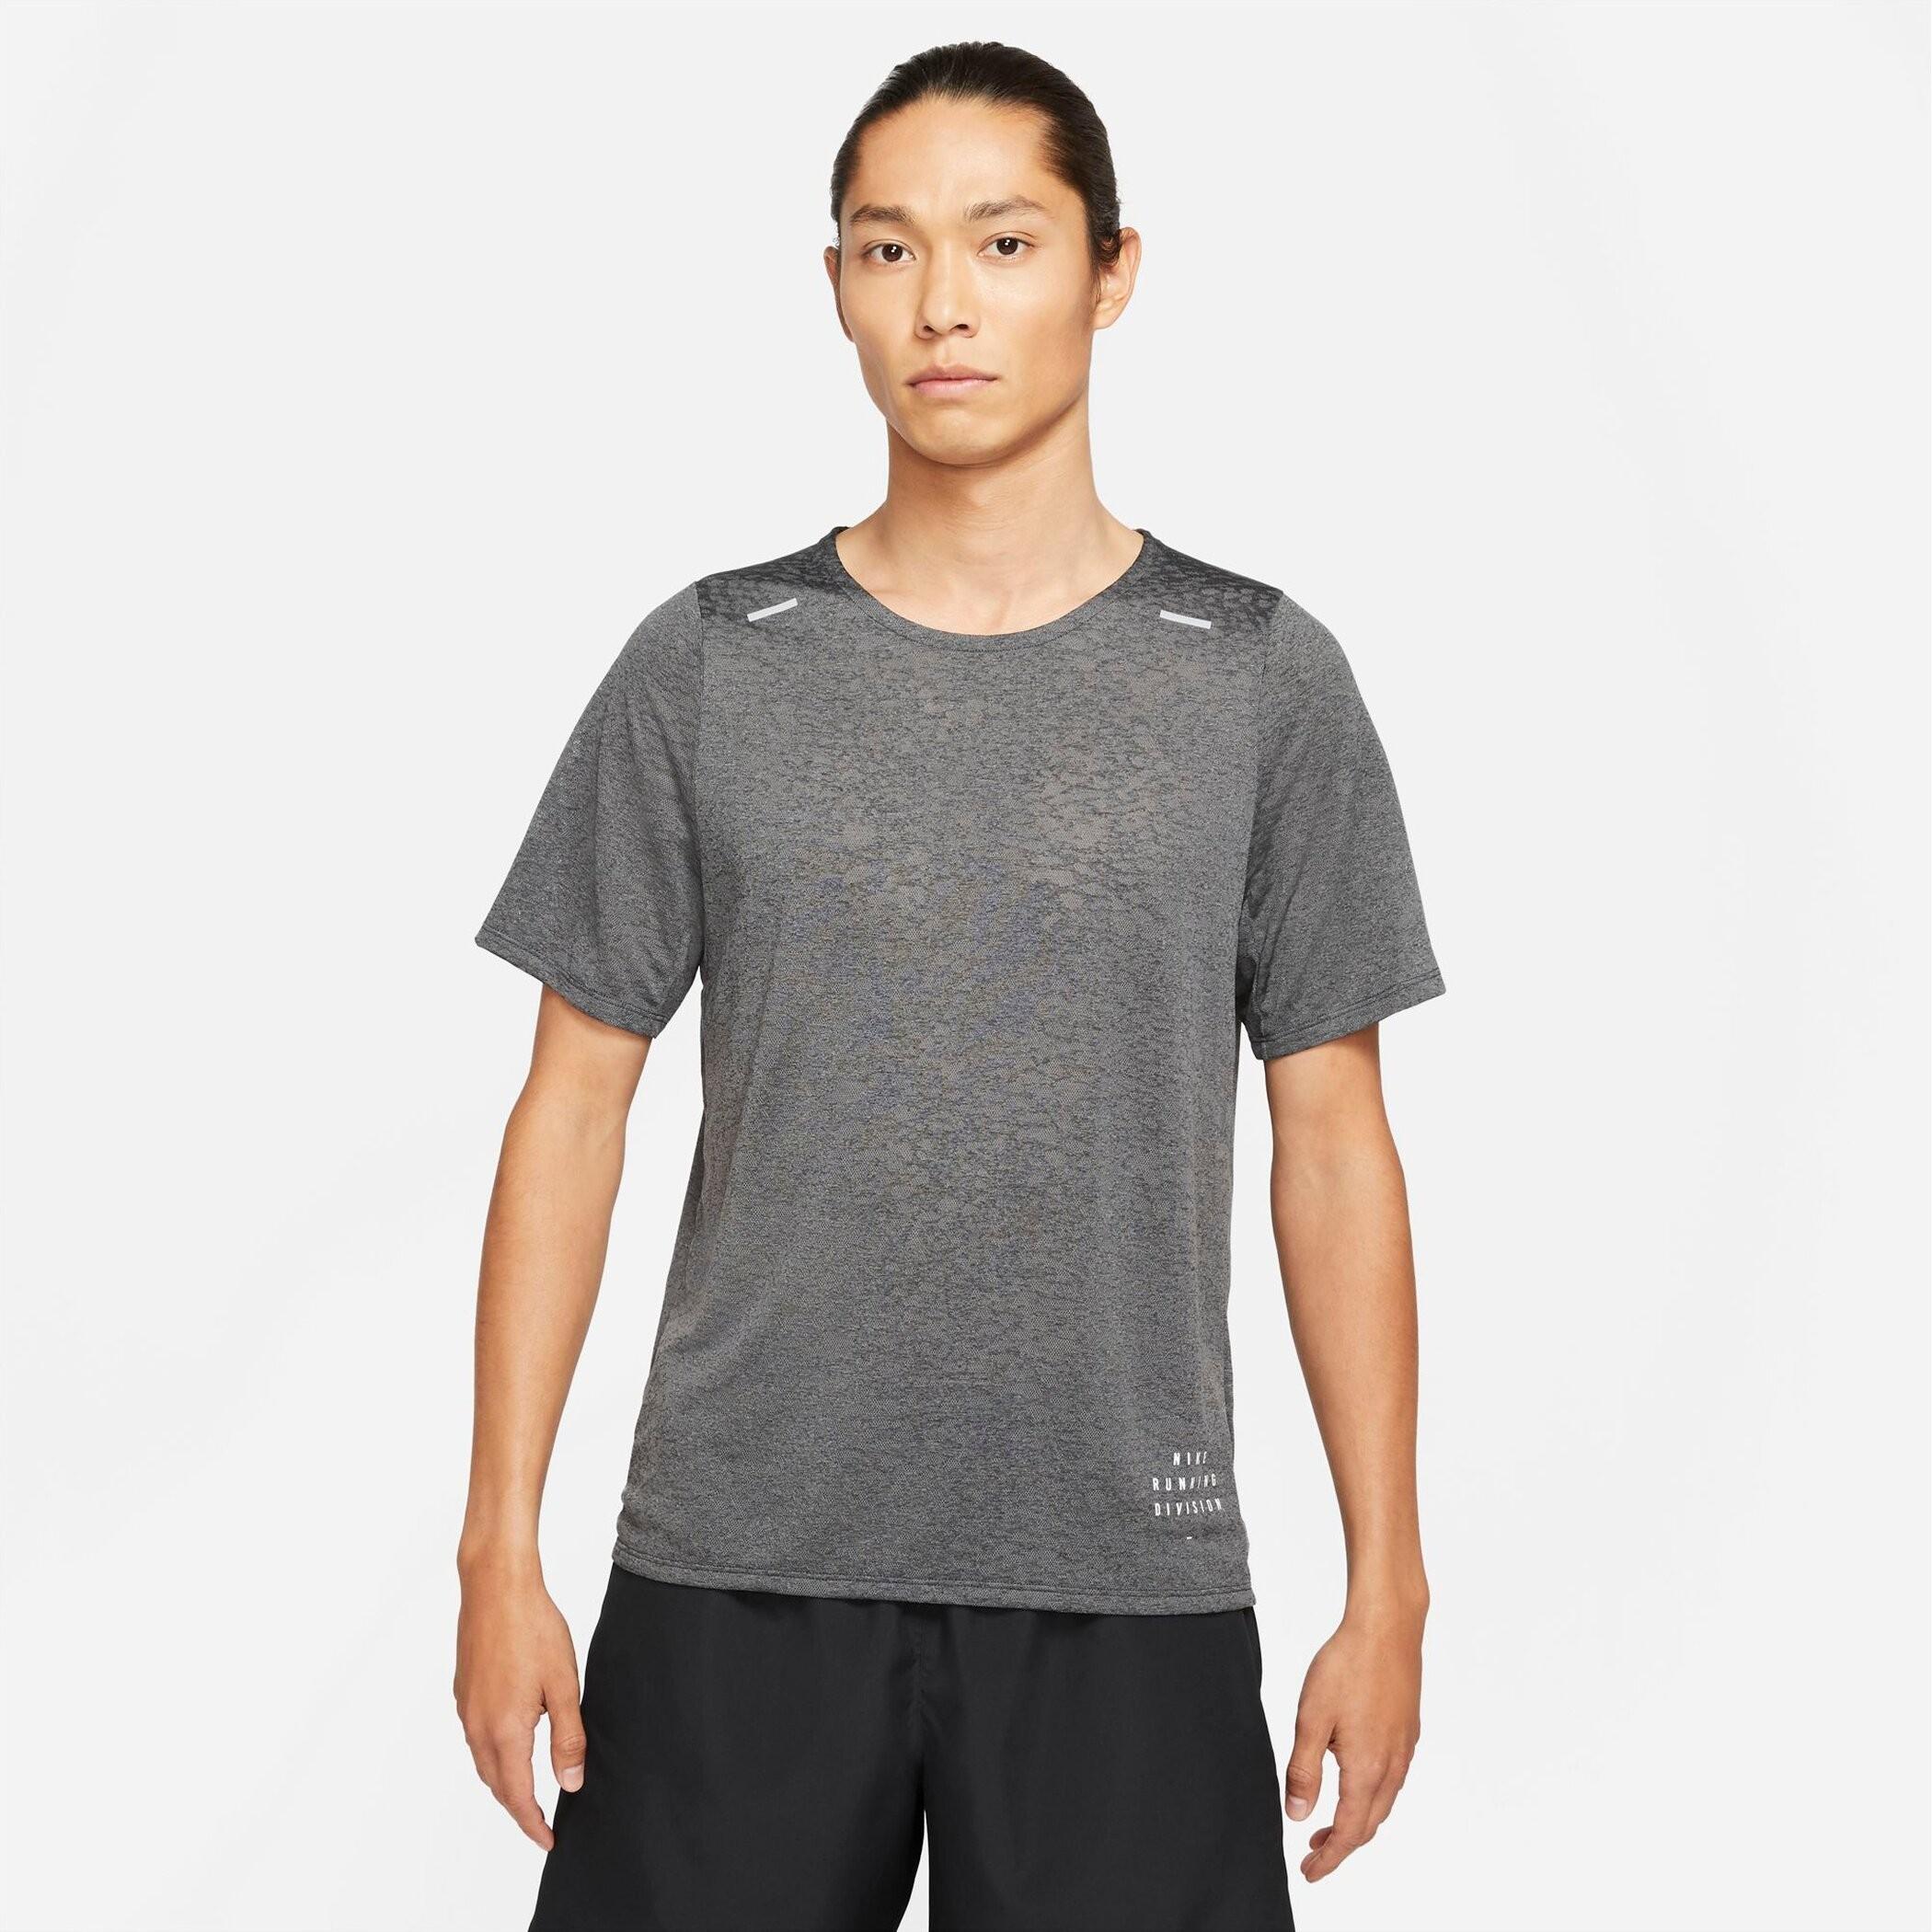 NIKE Herren T-Shirt Rise 365 Run Division